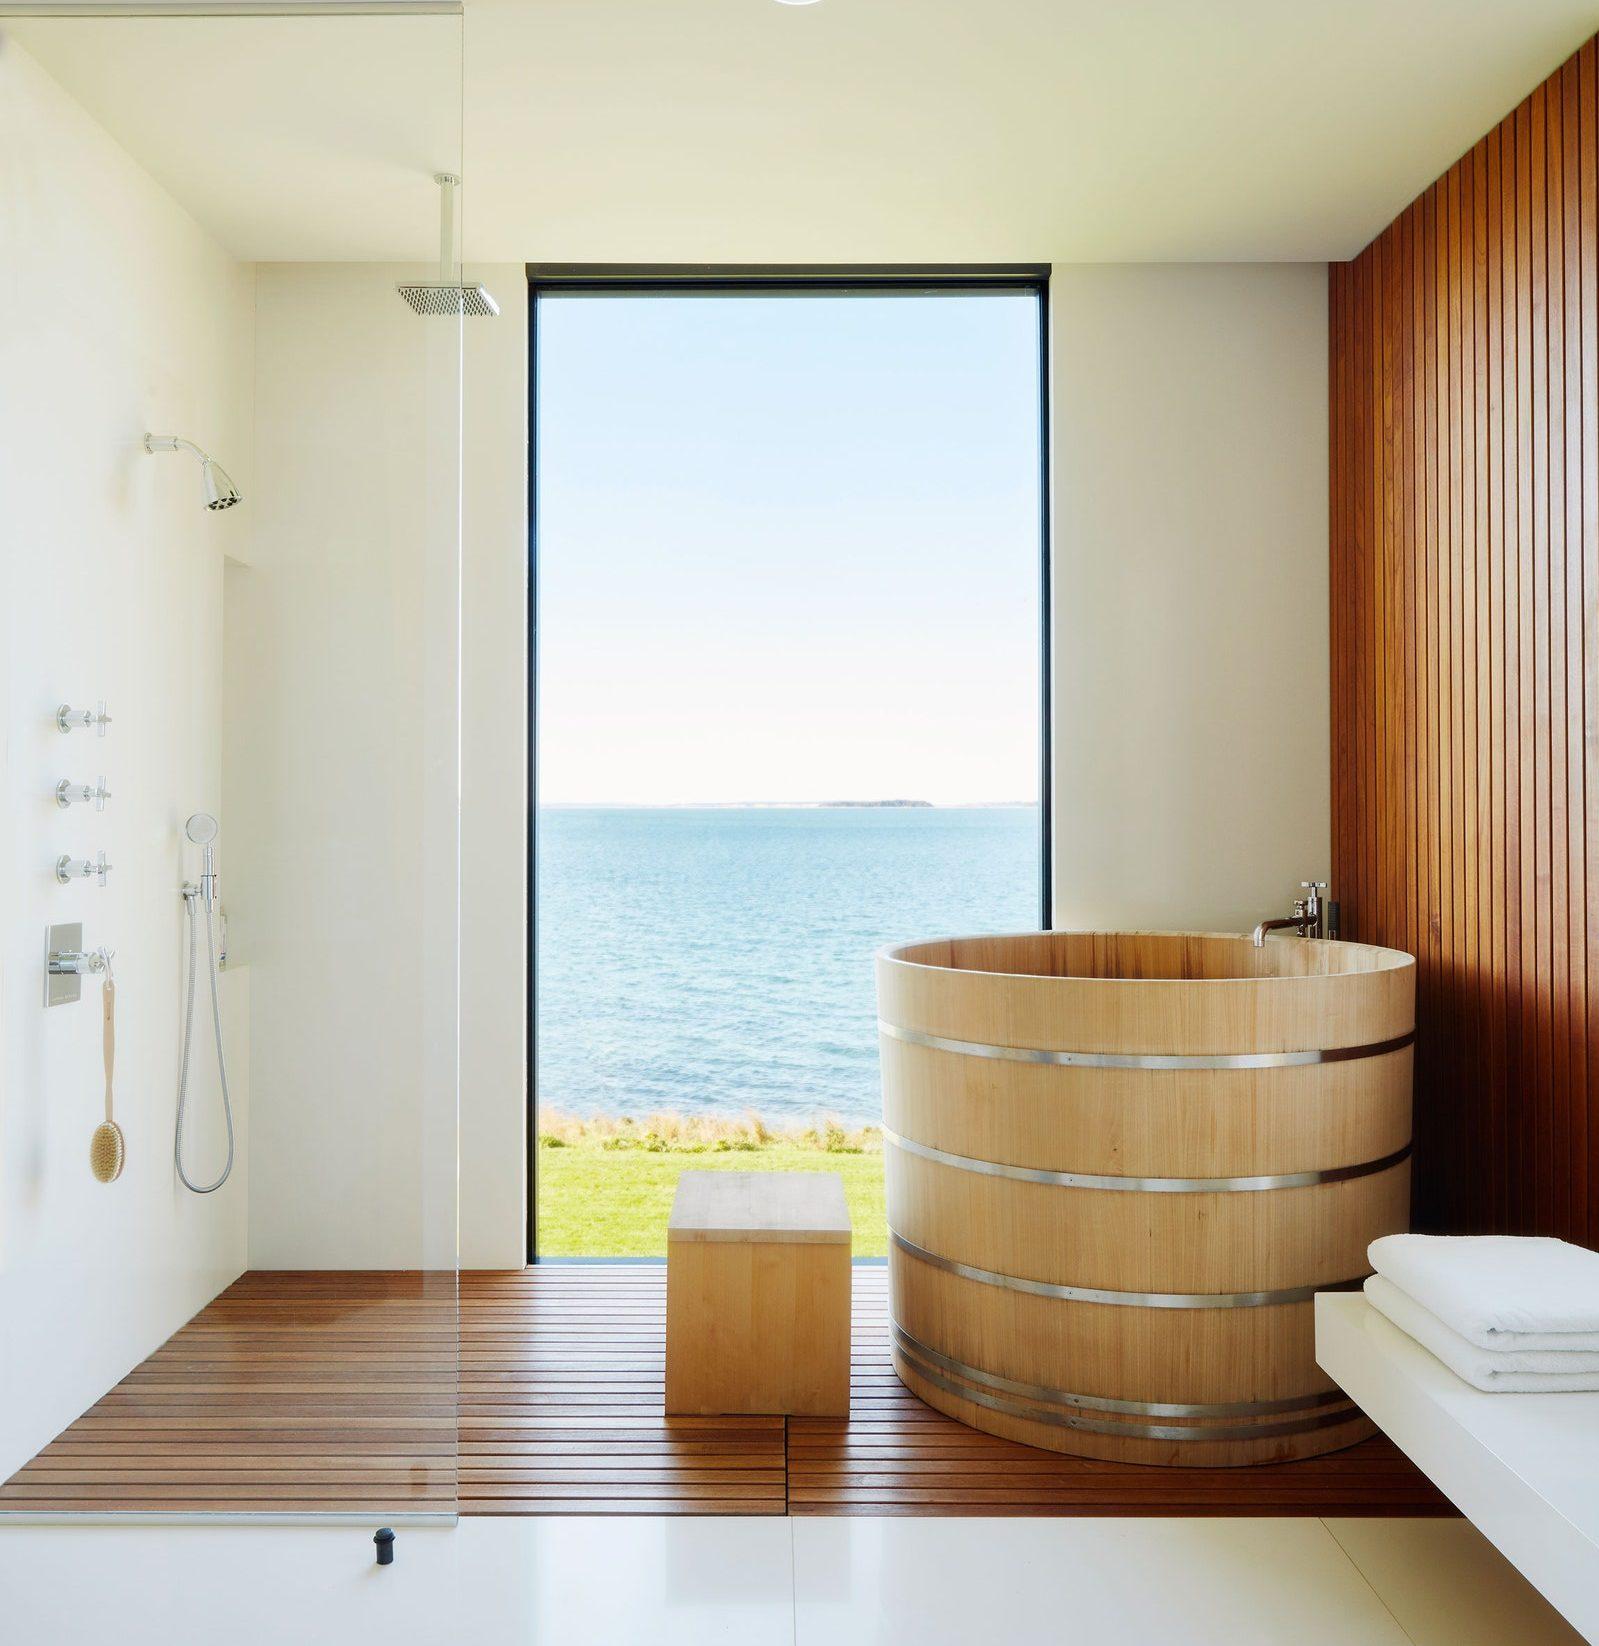 Bồn tắm gỗ kiểu Nhật